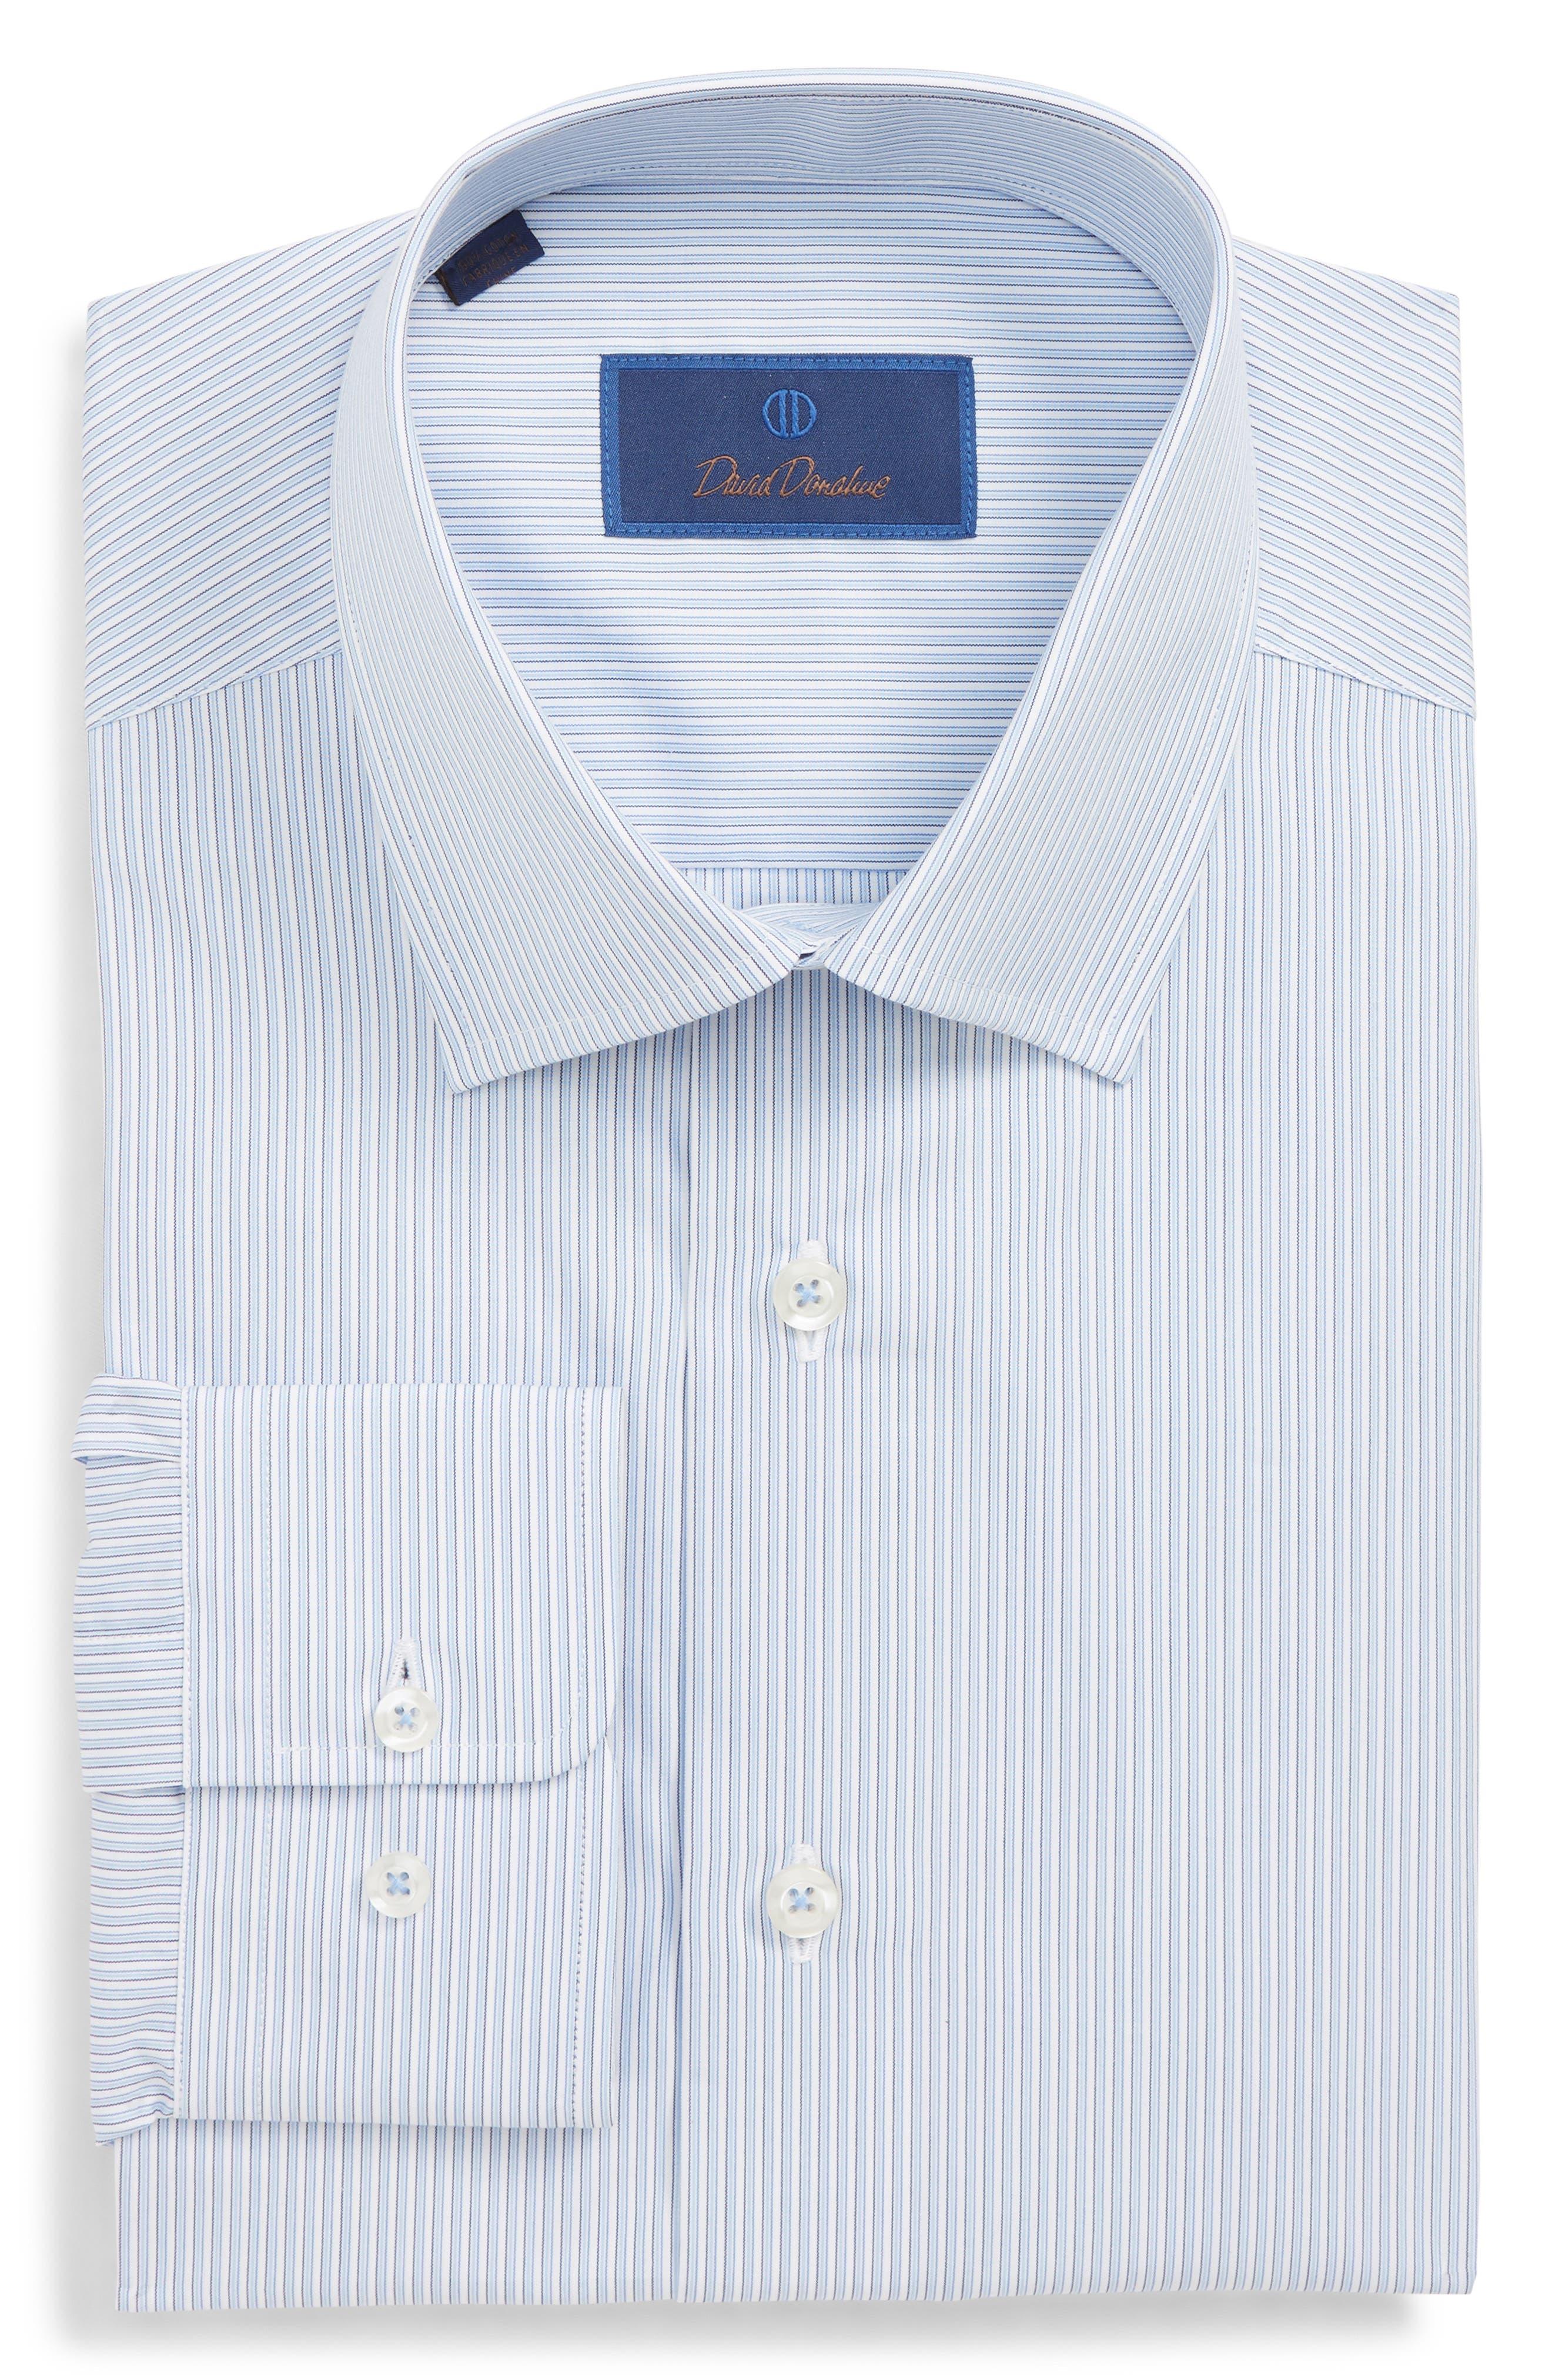 Regular Fit Stripe Dress Shirt,                             Main thumbnail 1, color,                             BLUE